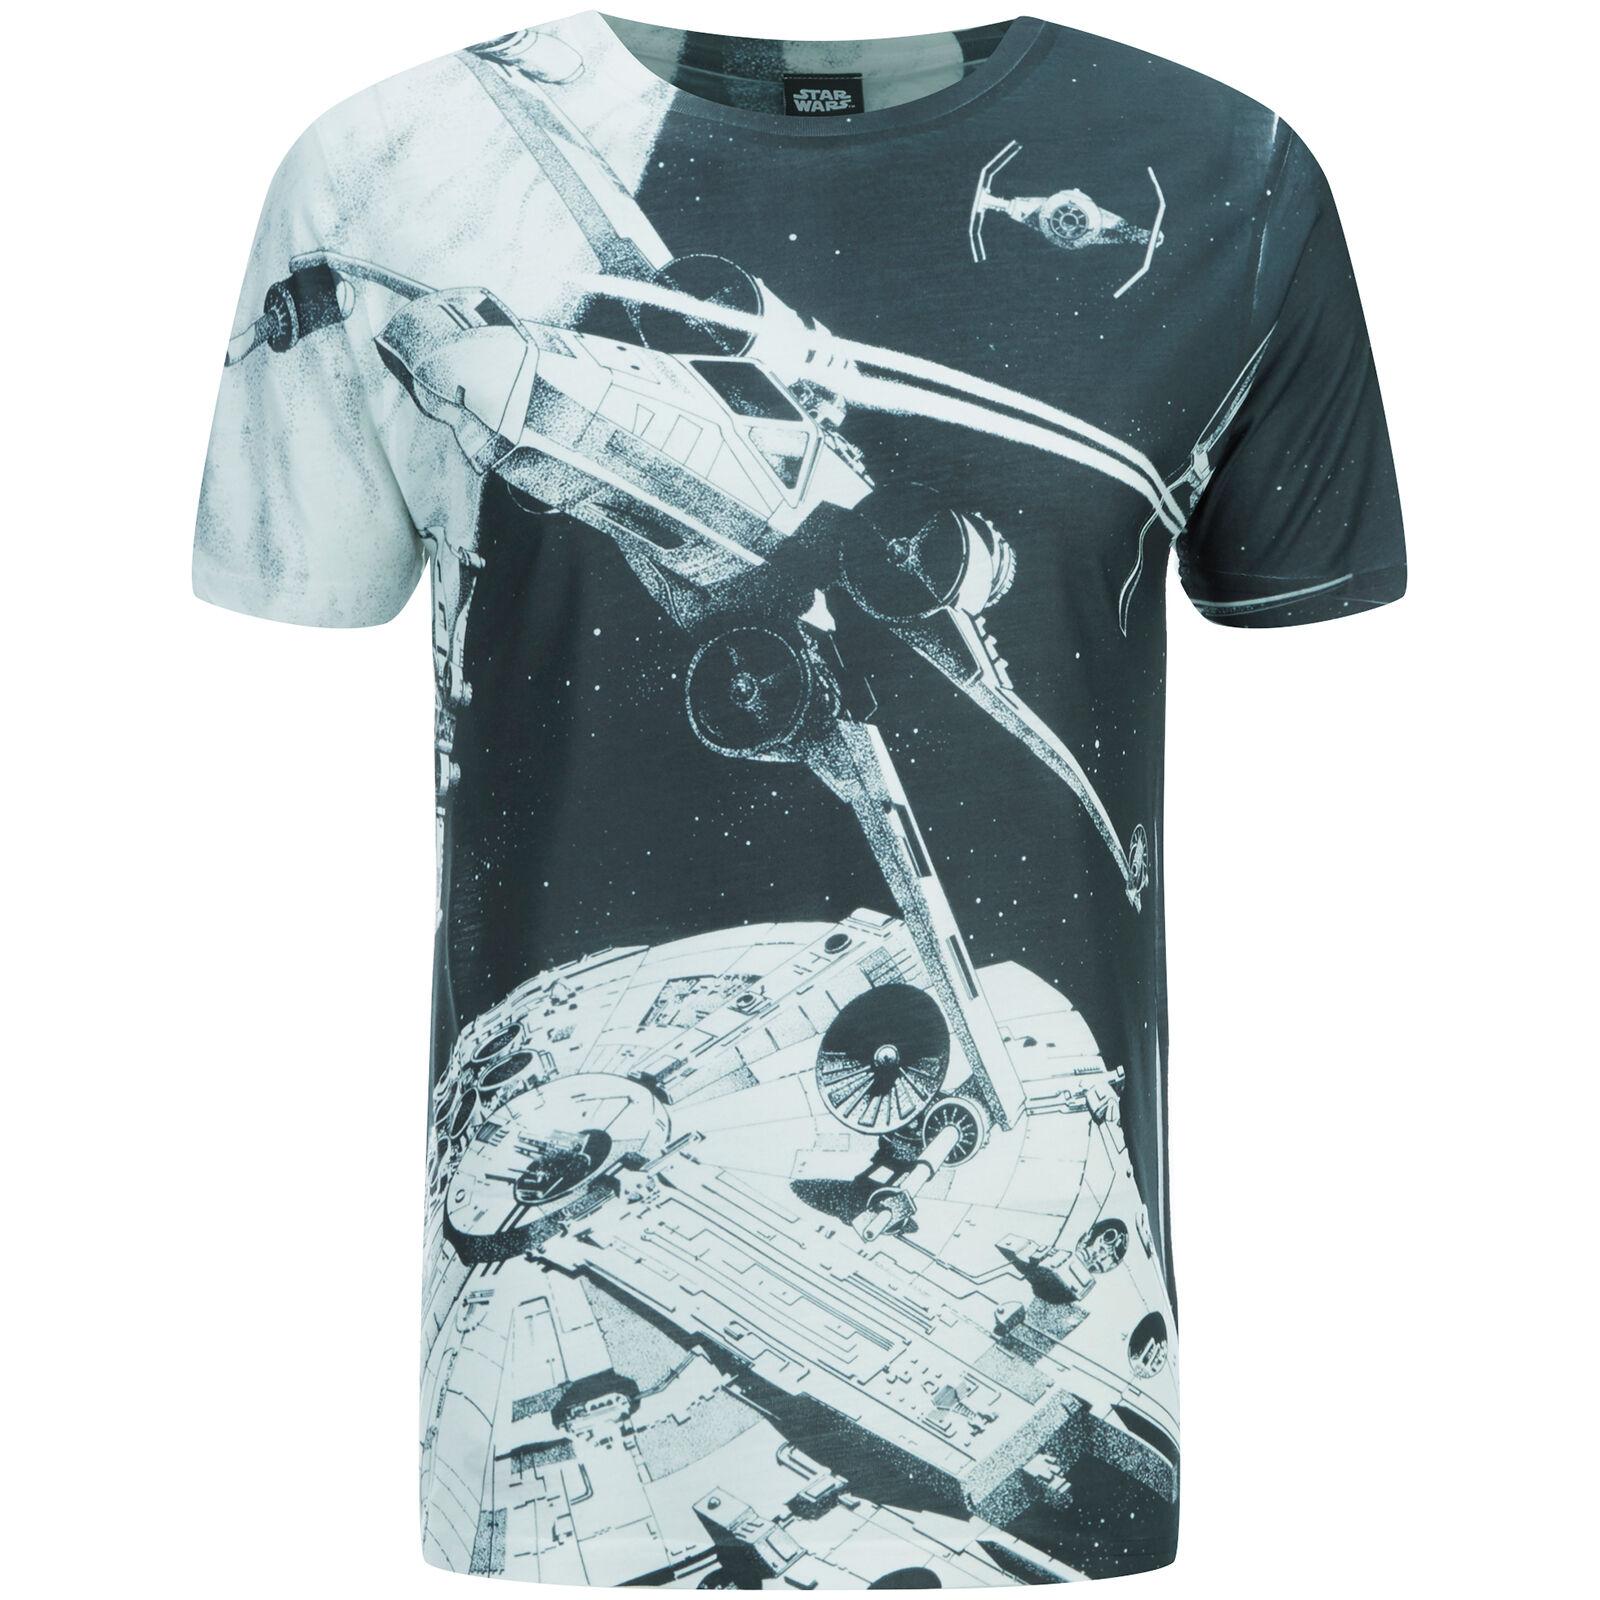 Geek Clothing Star Wars Men's Space Battle T-Shirt - Black - XL - Black